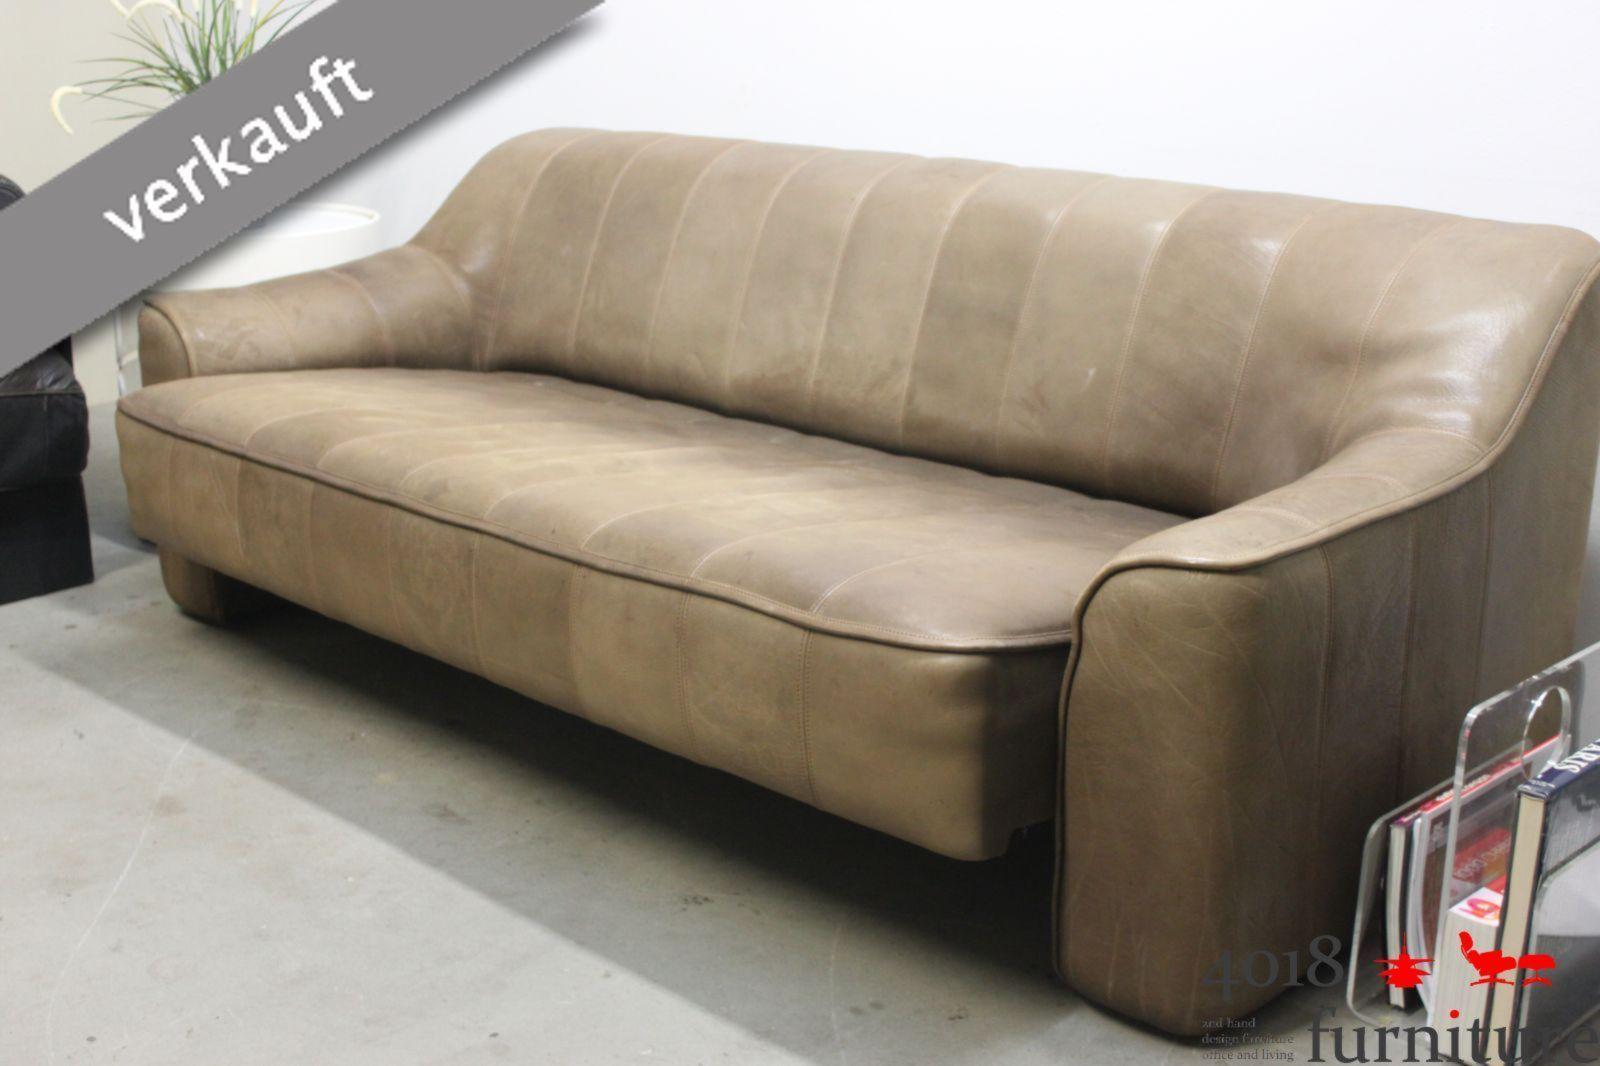 De Sede Ds 44 Neckleder Büffelleder Sofa Couch Canape 3 Sitzer Braun